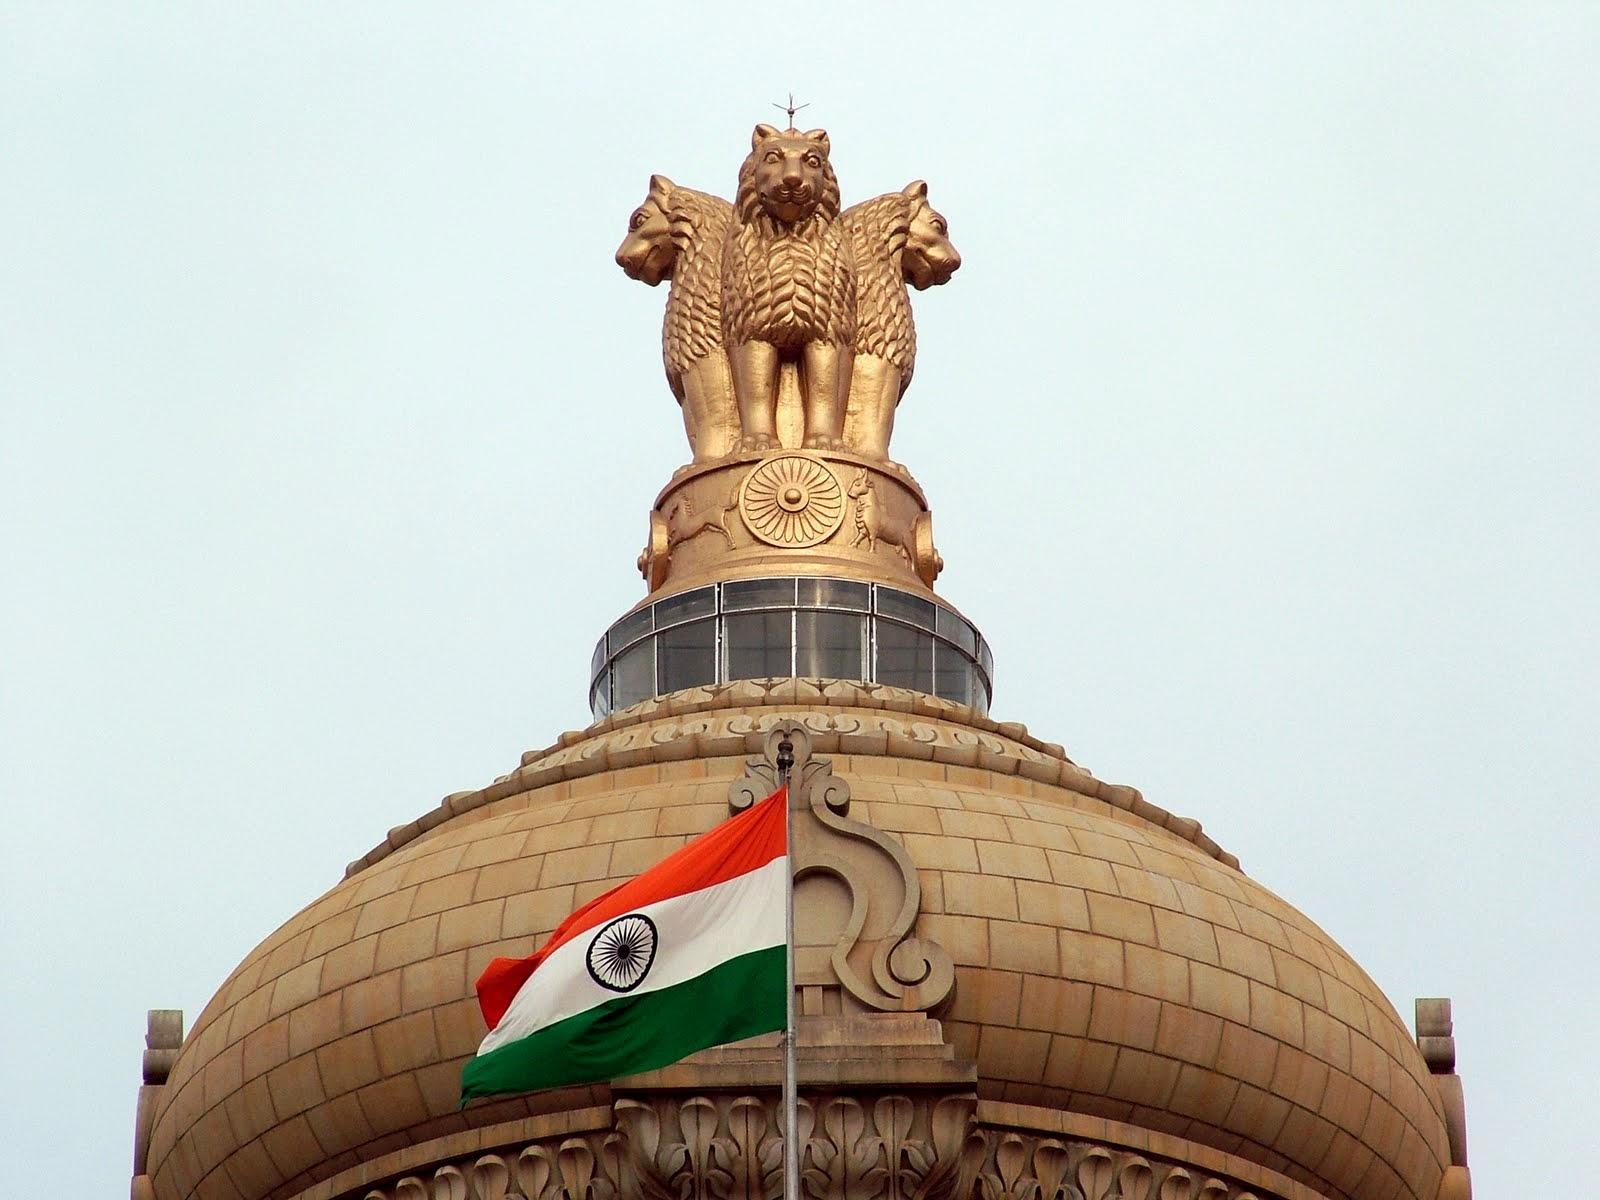 Uttar Pradesh government, Uttar Pradesh, 25 IAS officers, Transferred, Agra, Hapur, Ghaziabad, Amethi, Farukkhabad, Basti, Gonda, Mirzapur, Varanasi,Prime Minister, Narendra Modi,